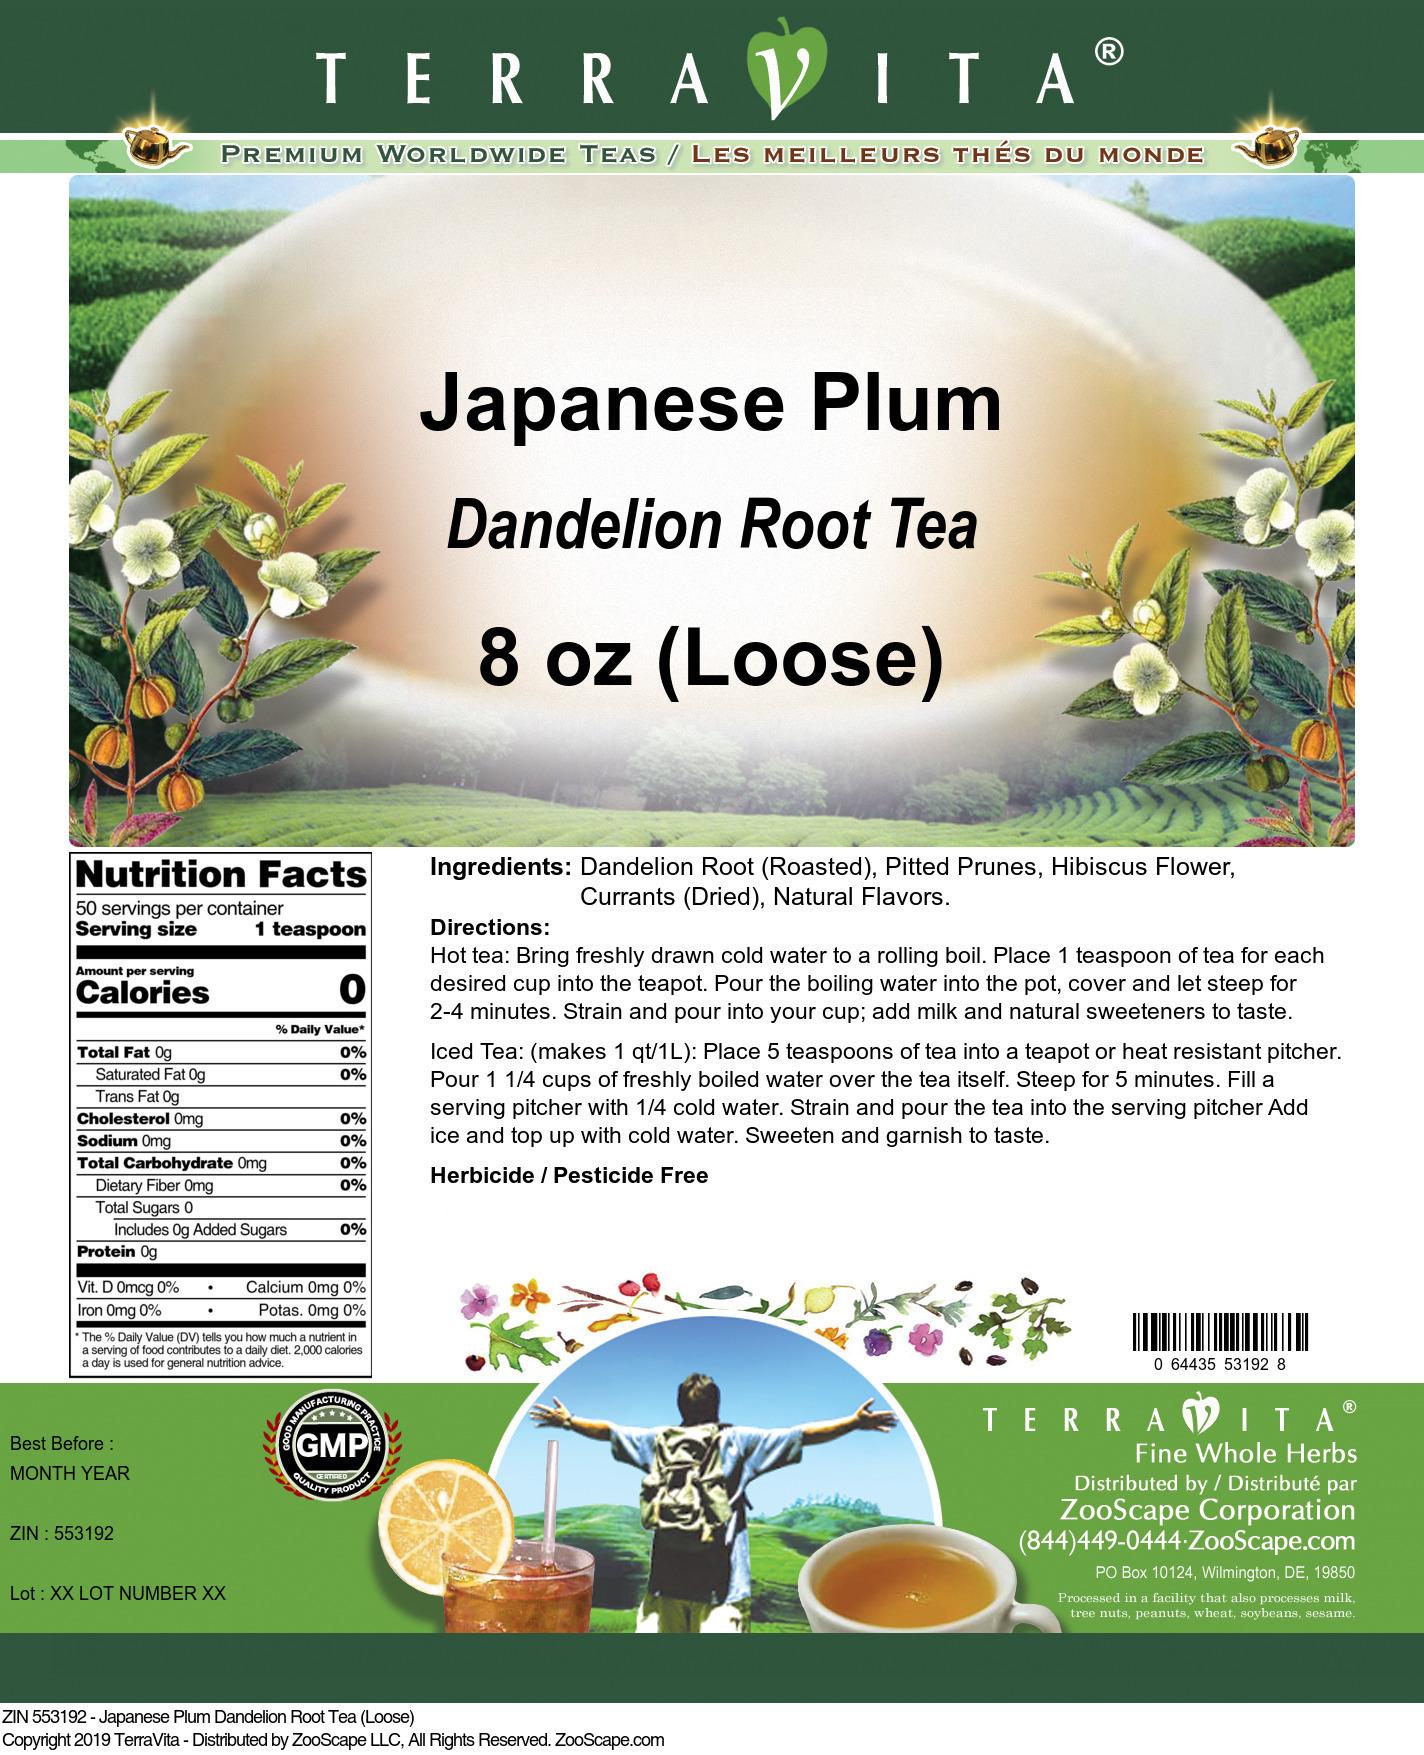 Japanese Plum Dandelion Root Tea (Loose)